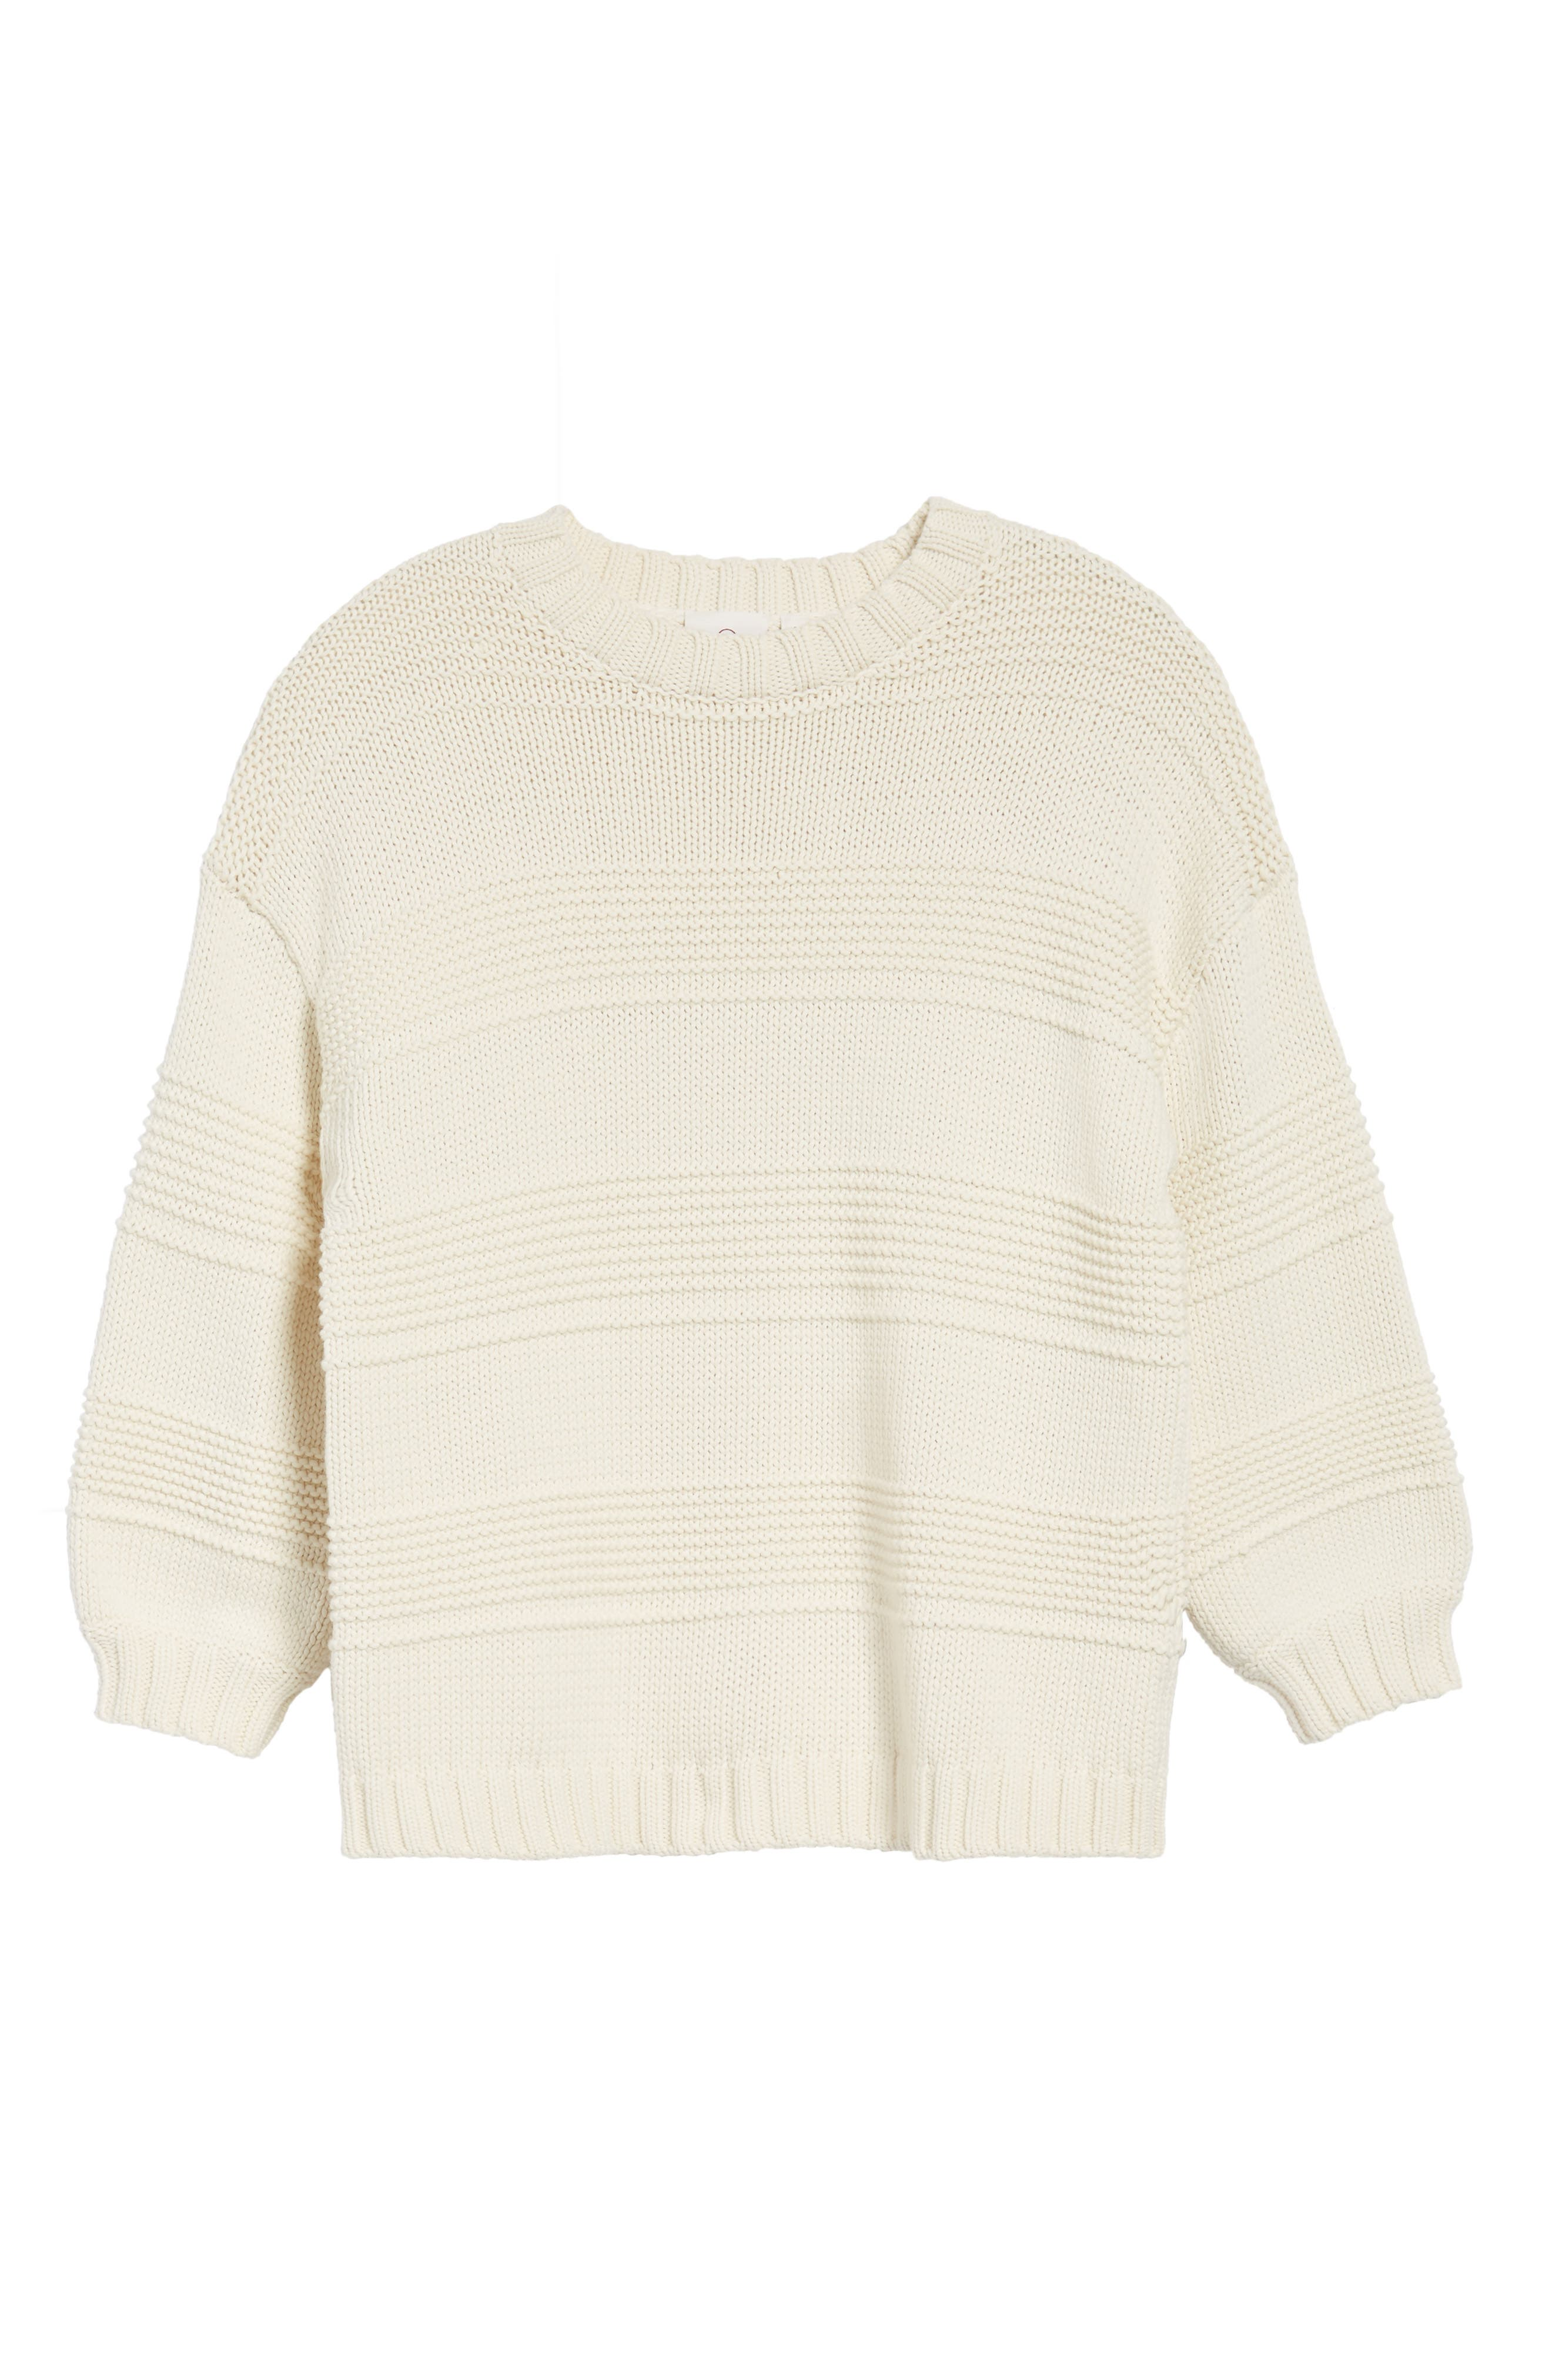 Sabrina Crewneck Sweater,                             Alternate thumbnail 6, color,                             BRIGHT CREAM